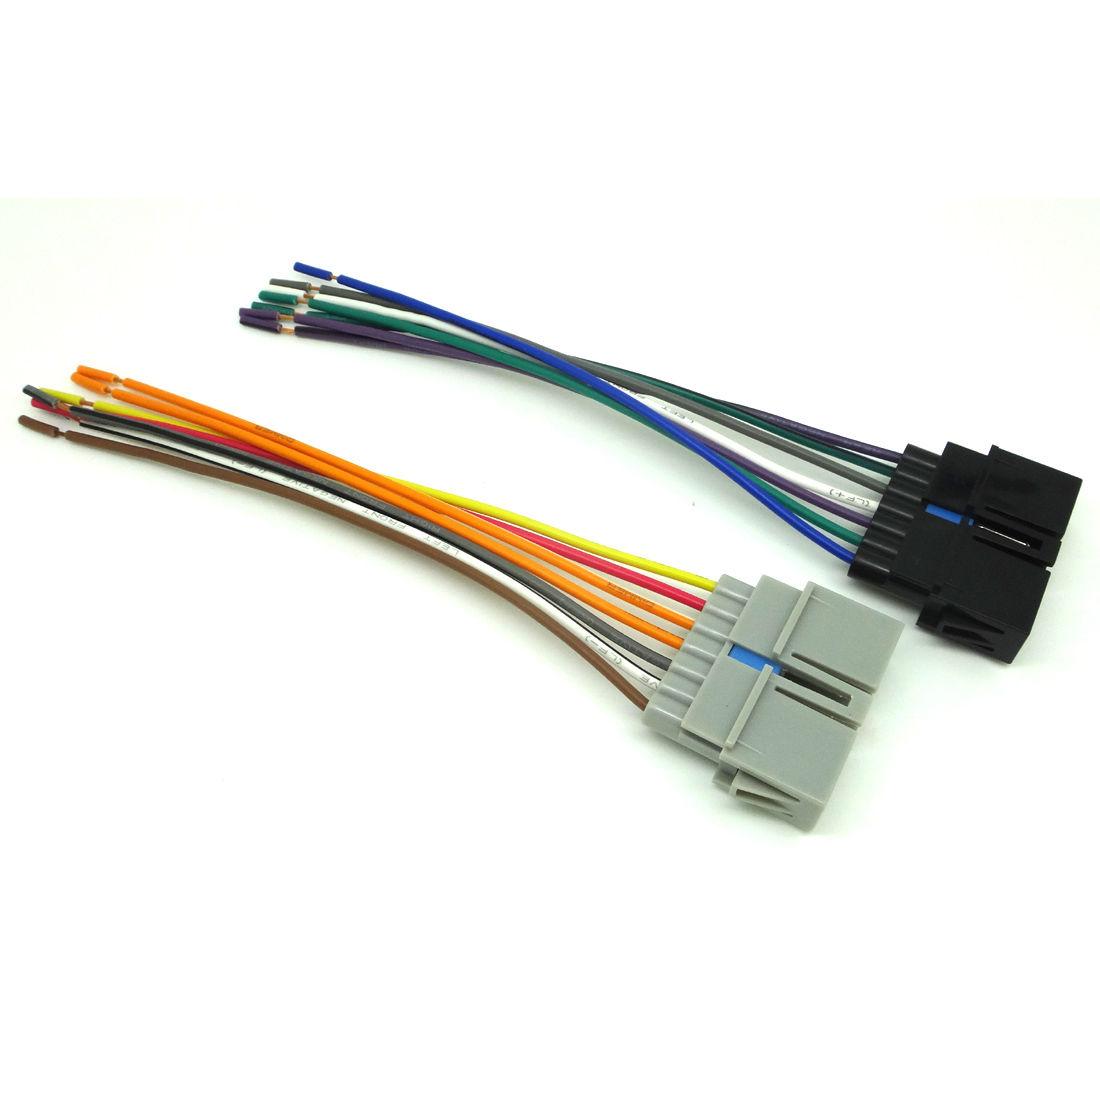 hight resolution of lennox g14 field wiring photo lennoxg14fieldwiringdiagramjpg lennox g14 field wiring photo lennoxg14fieldwiringdiagramjpg